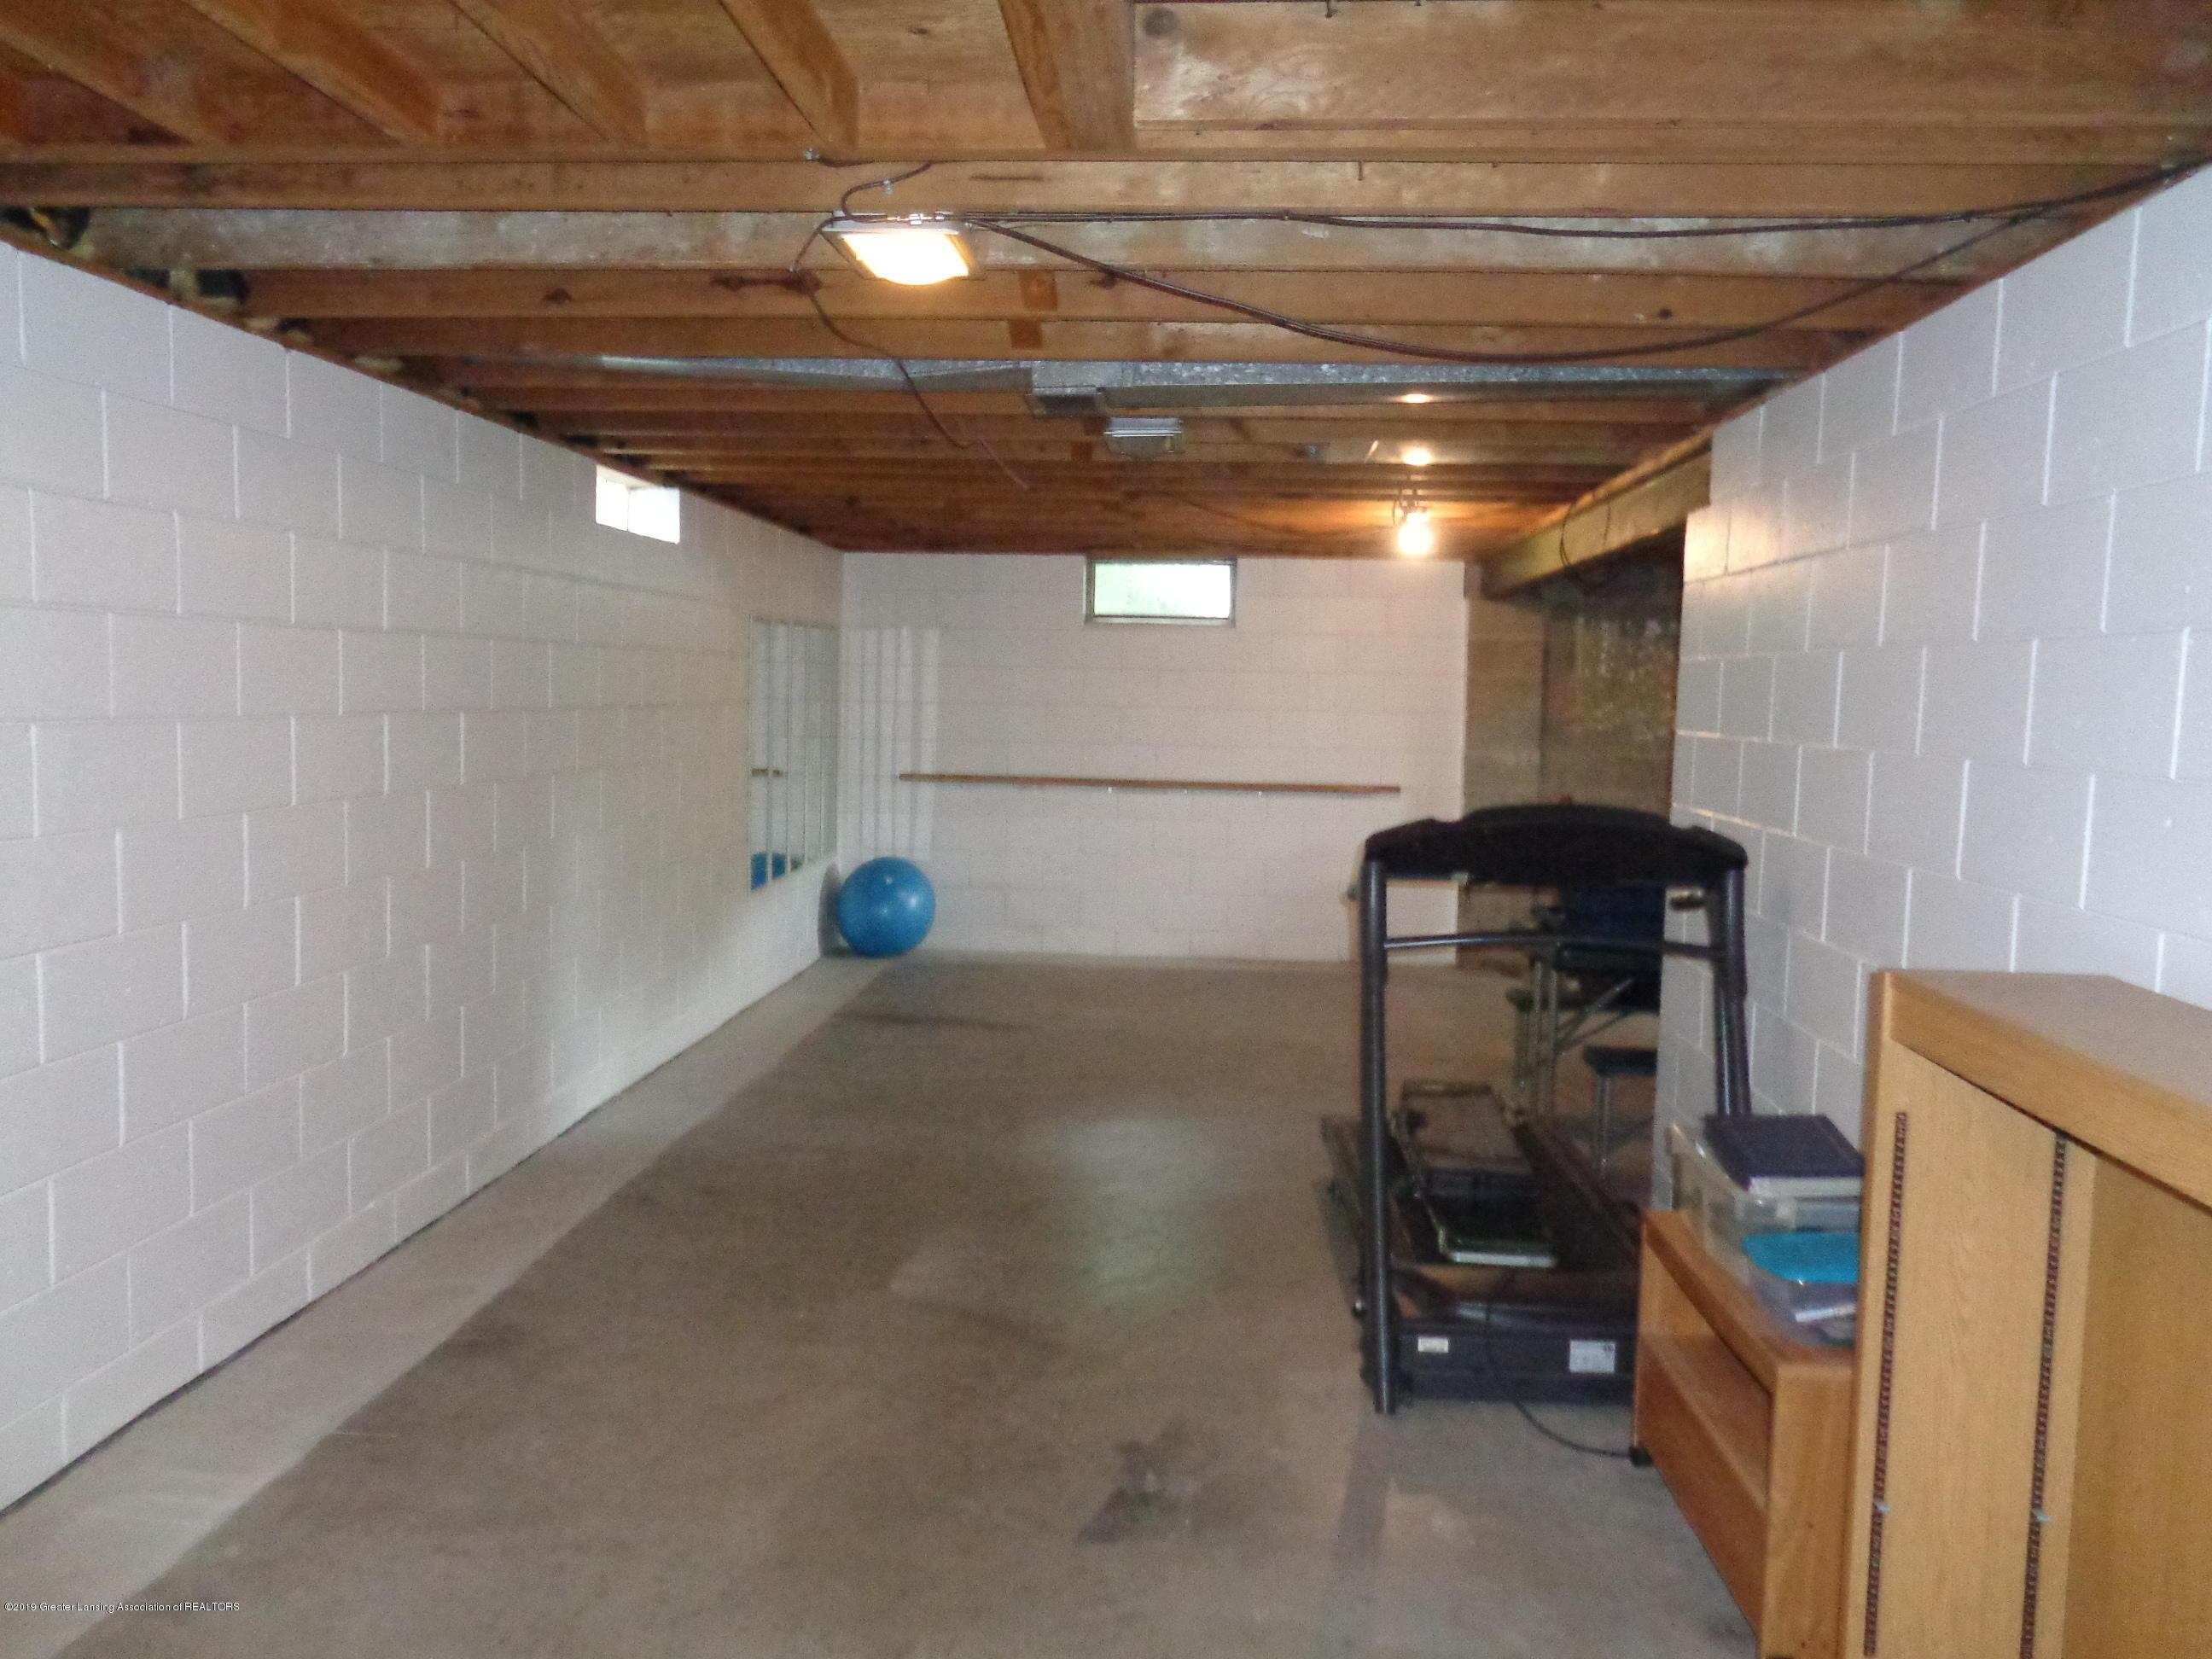 3525 W Kalamazoo St - kalamazoo basement 3 - 17